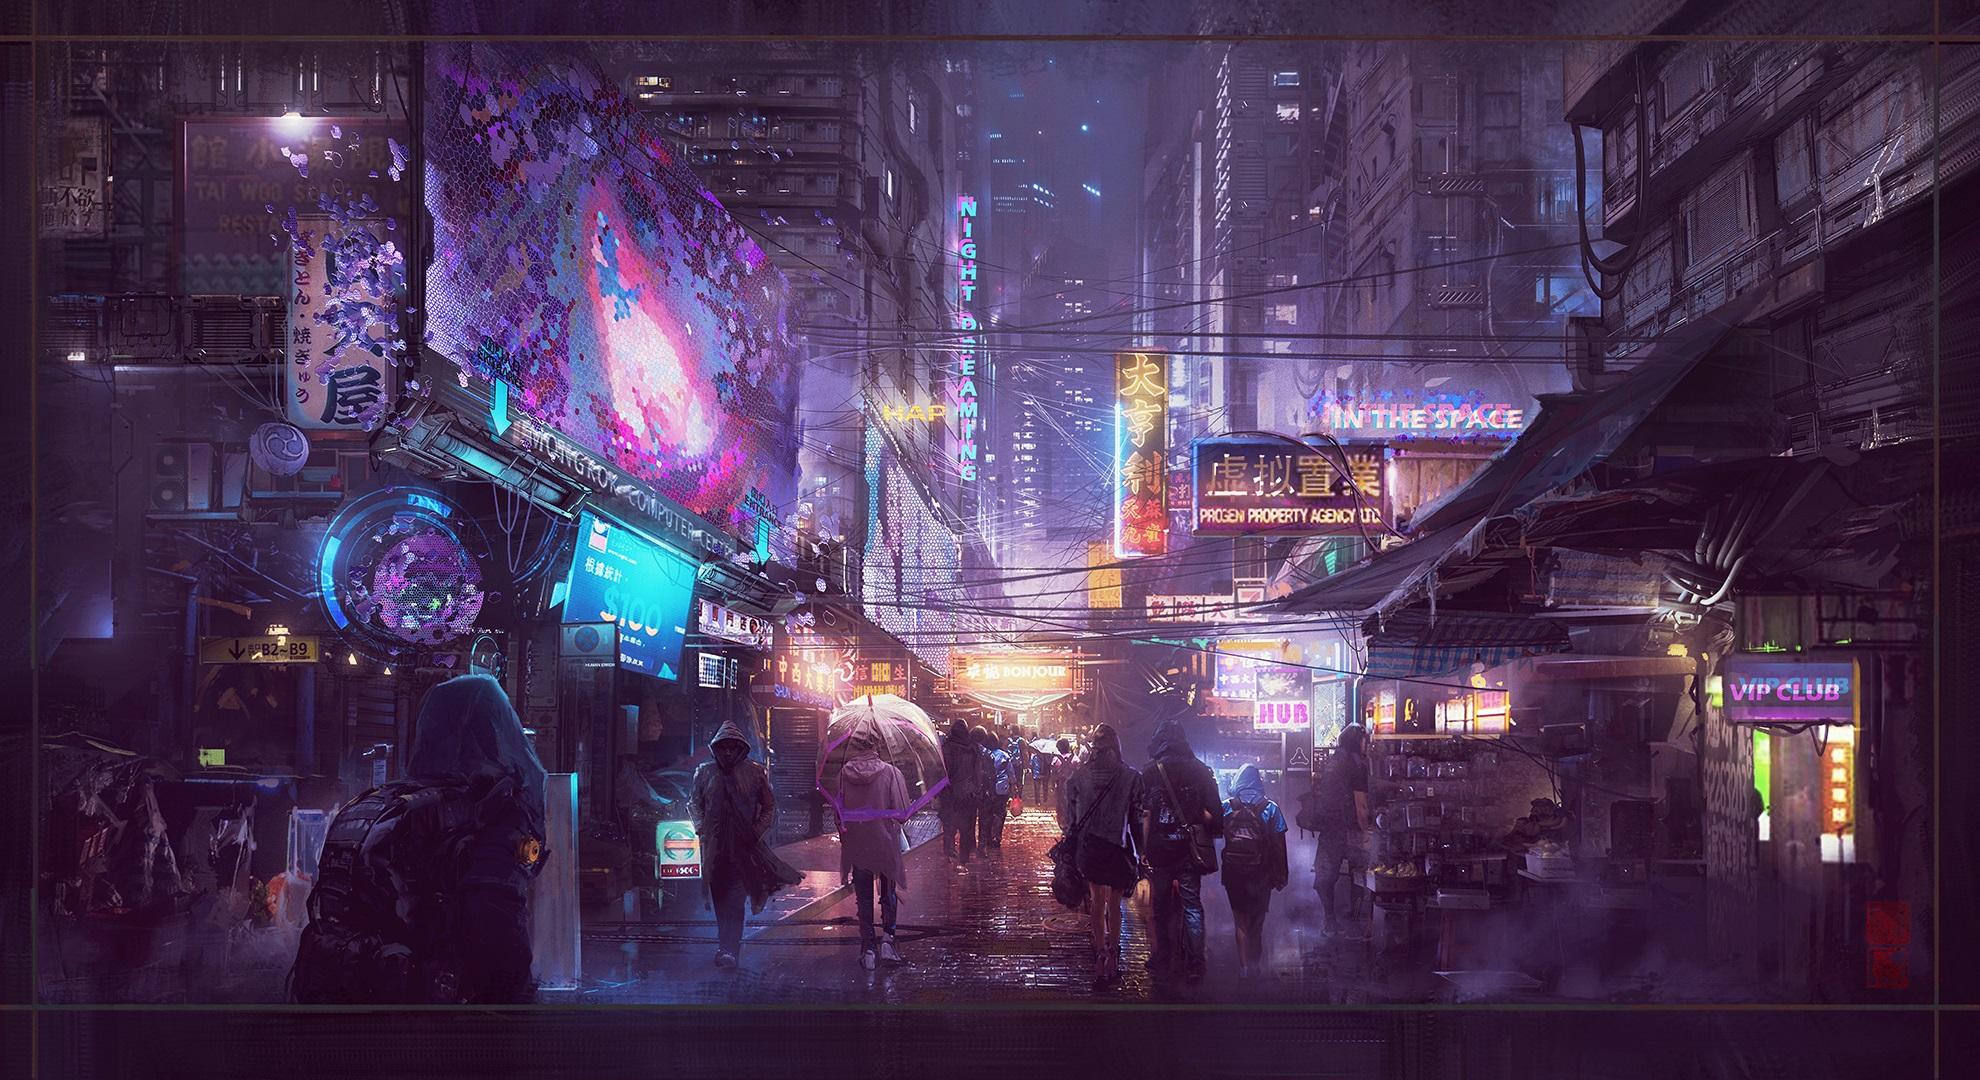 General 1980x1080 cyberpunk neon Donglu Yu rain